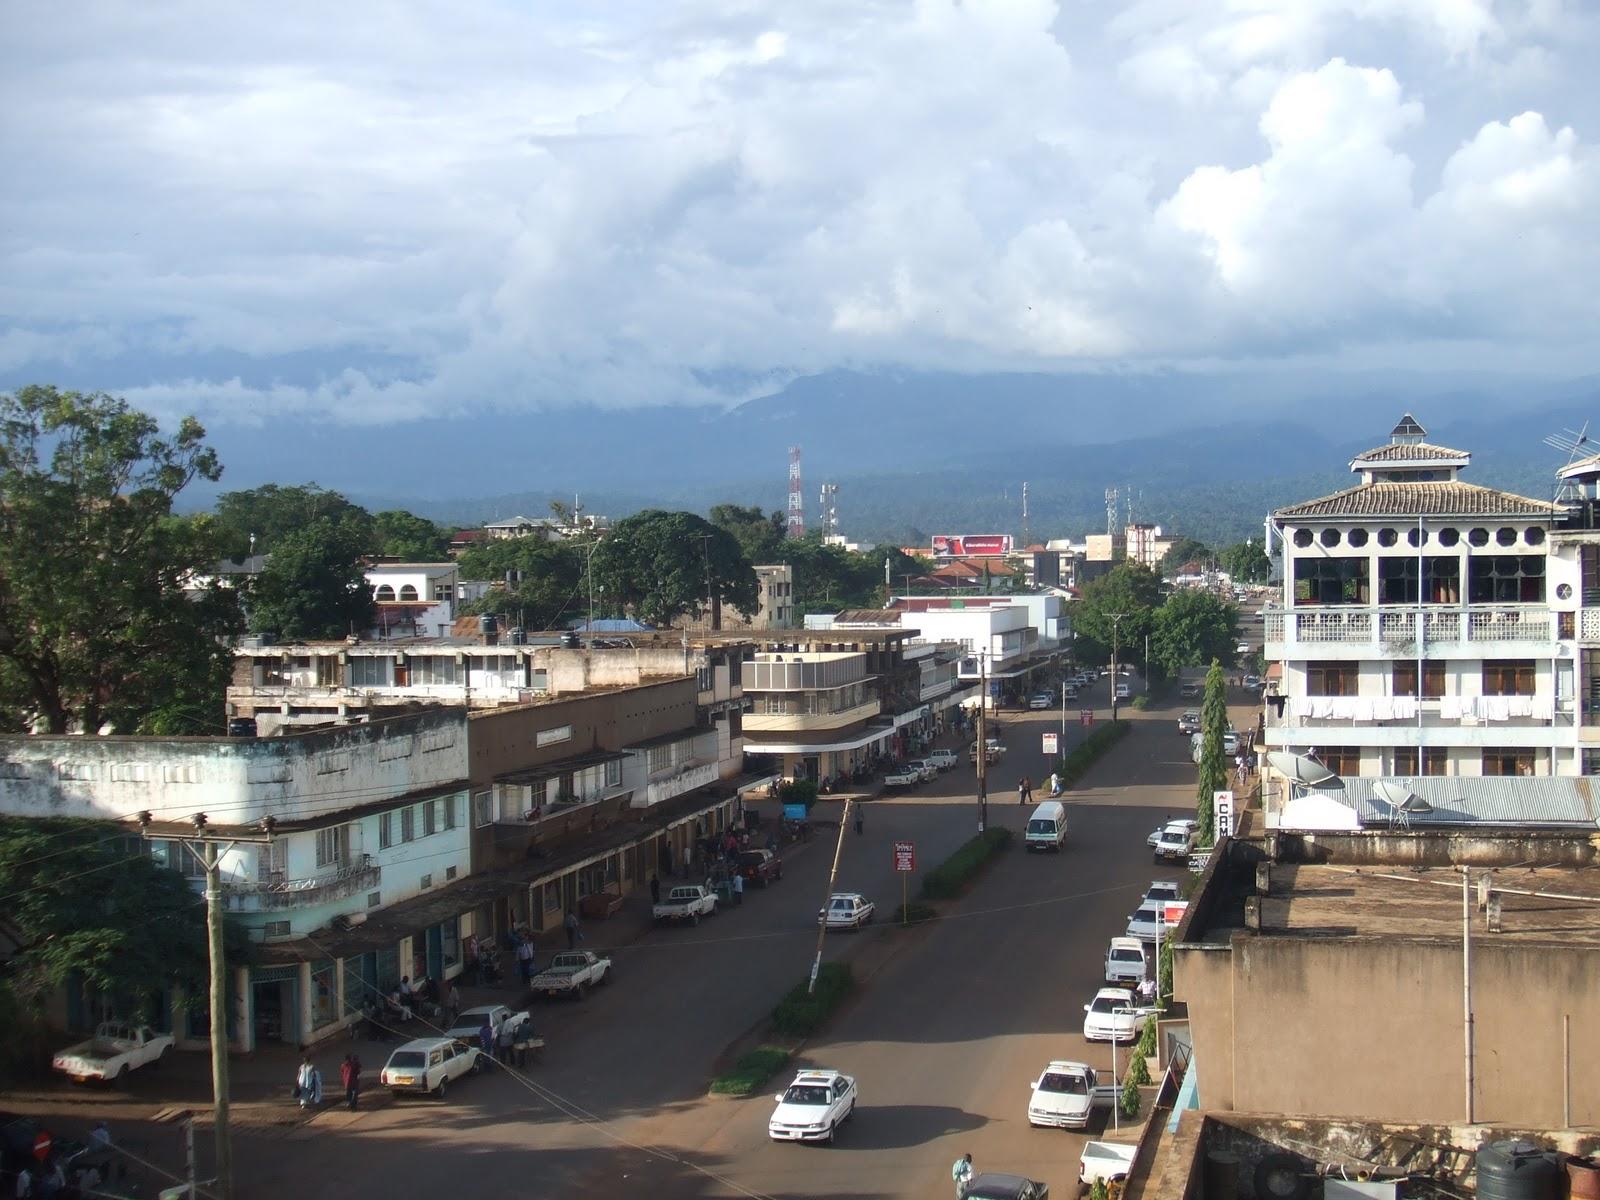 Moshi Tanzania  city pictures gallery : Moshi, Tanzania